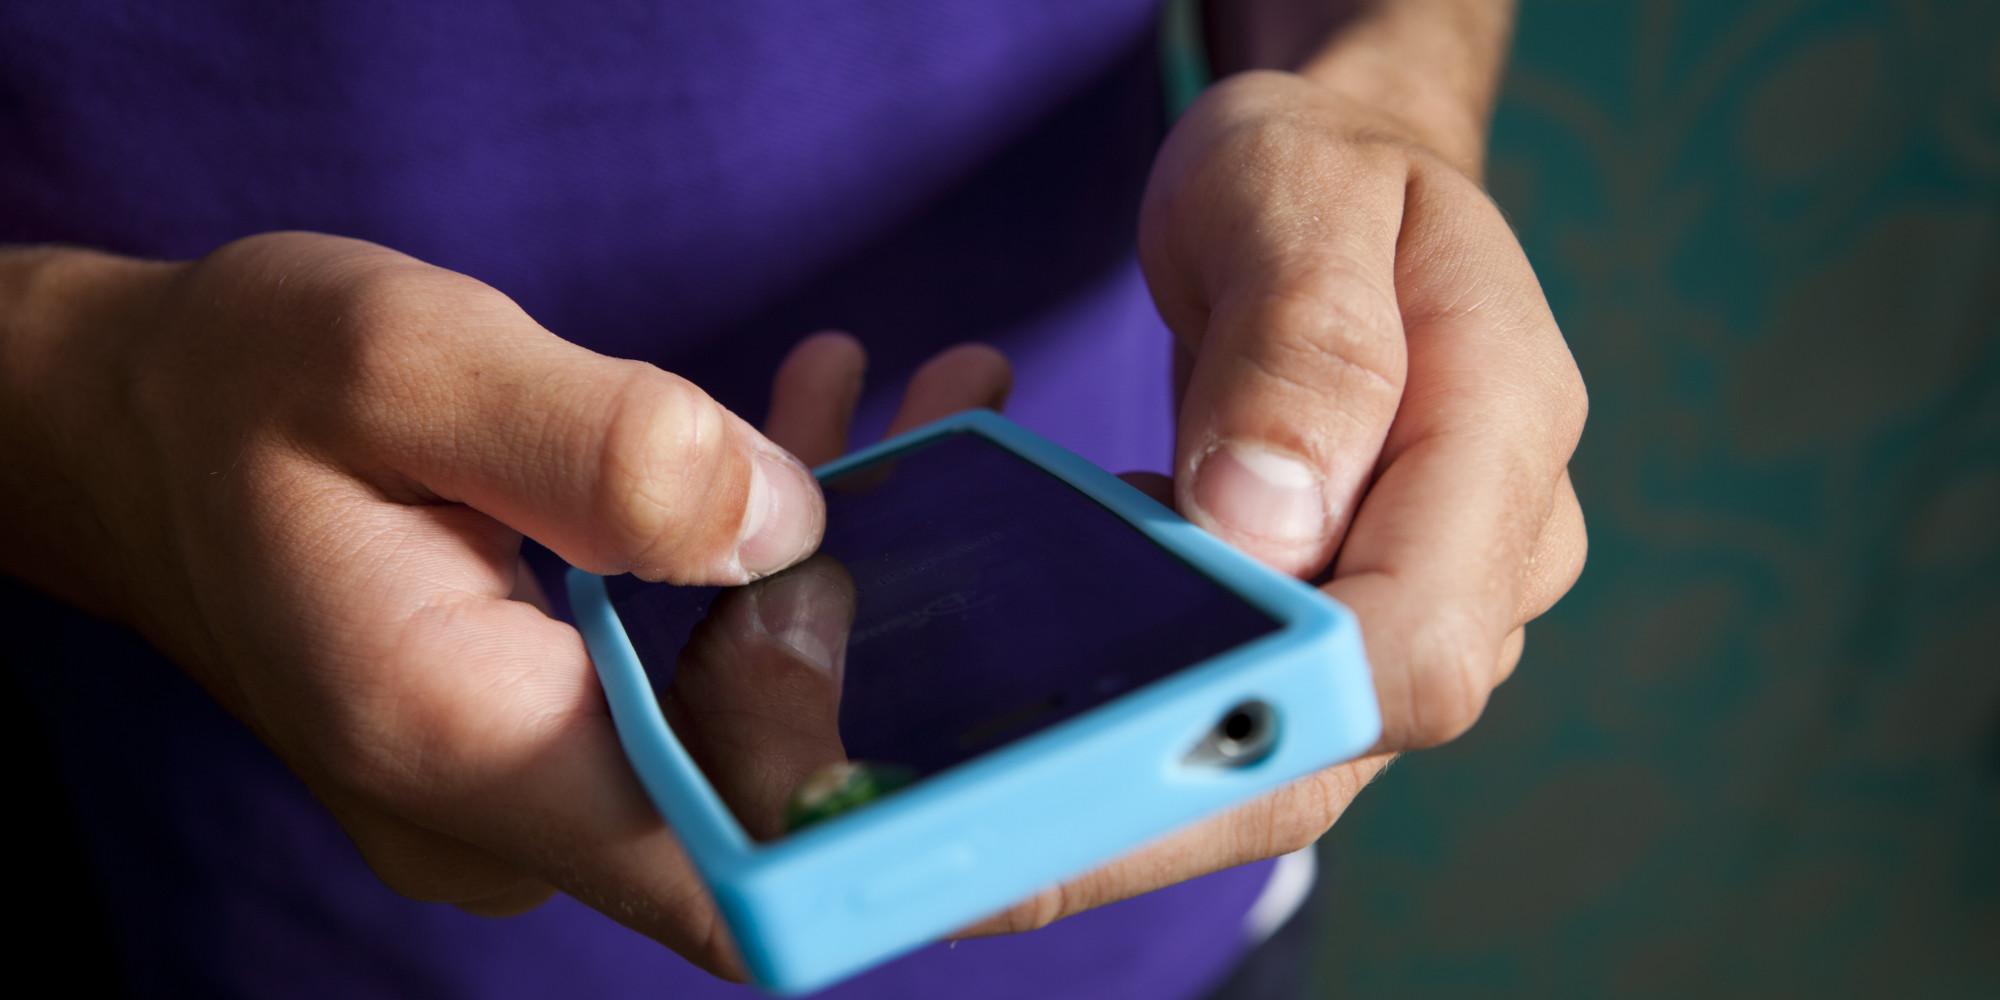 Has your flirt texting turned into cheating huffpost buycottarizona